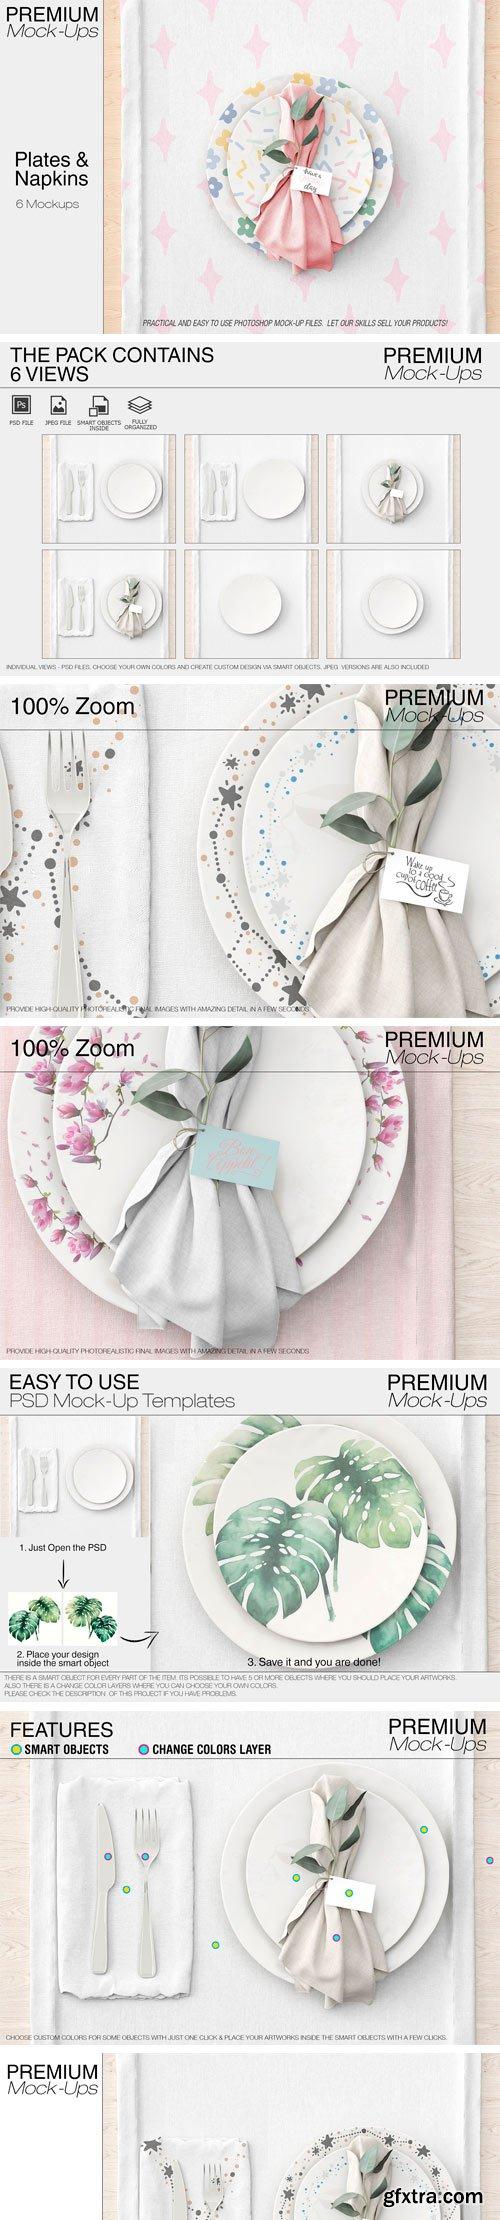 CM - Plates & Tablecloth Set 2362548